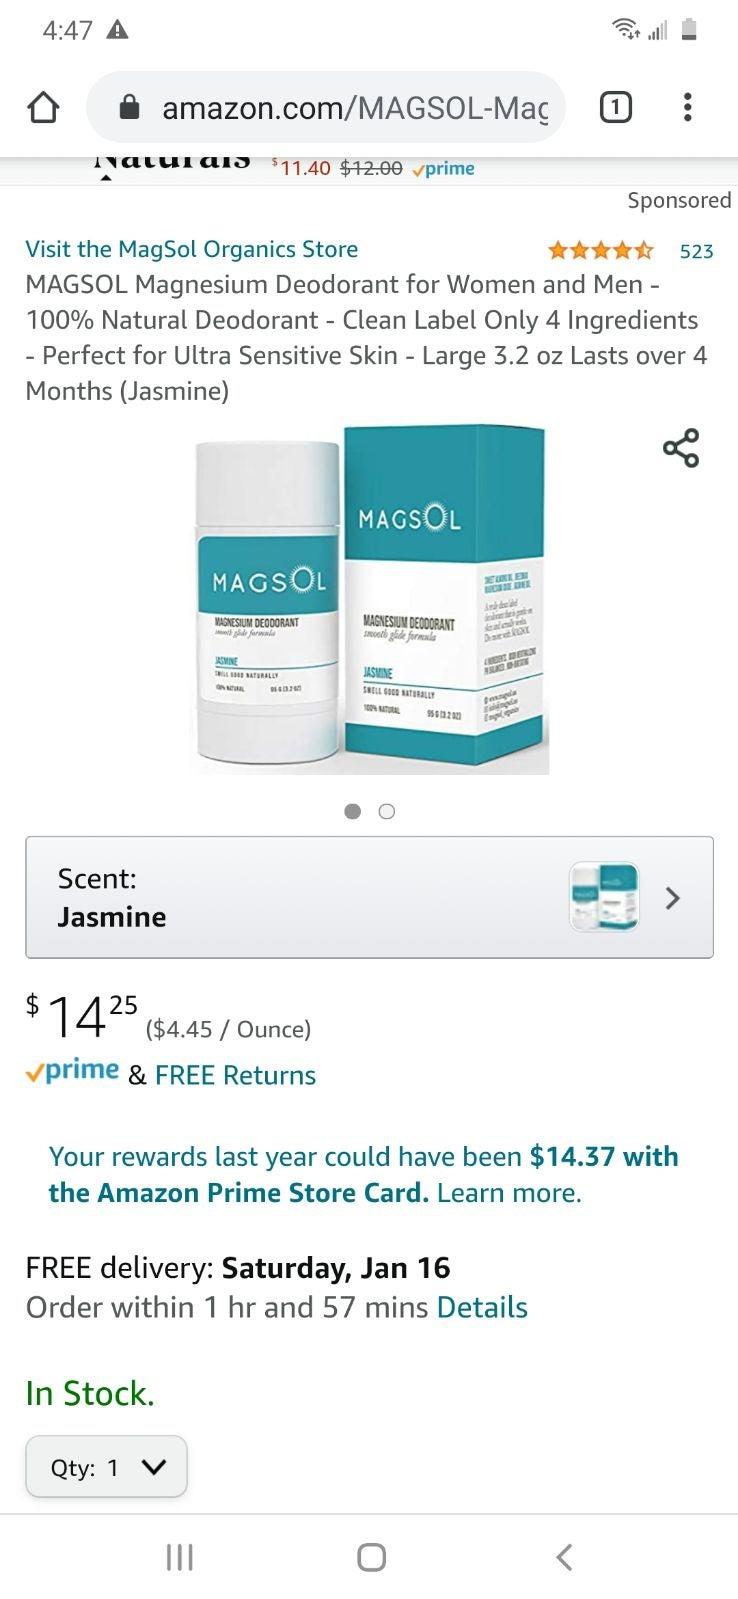 MagSol